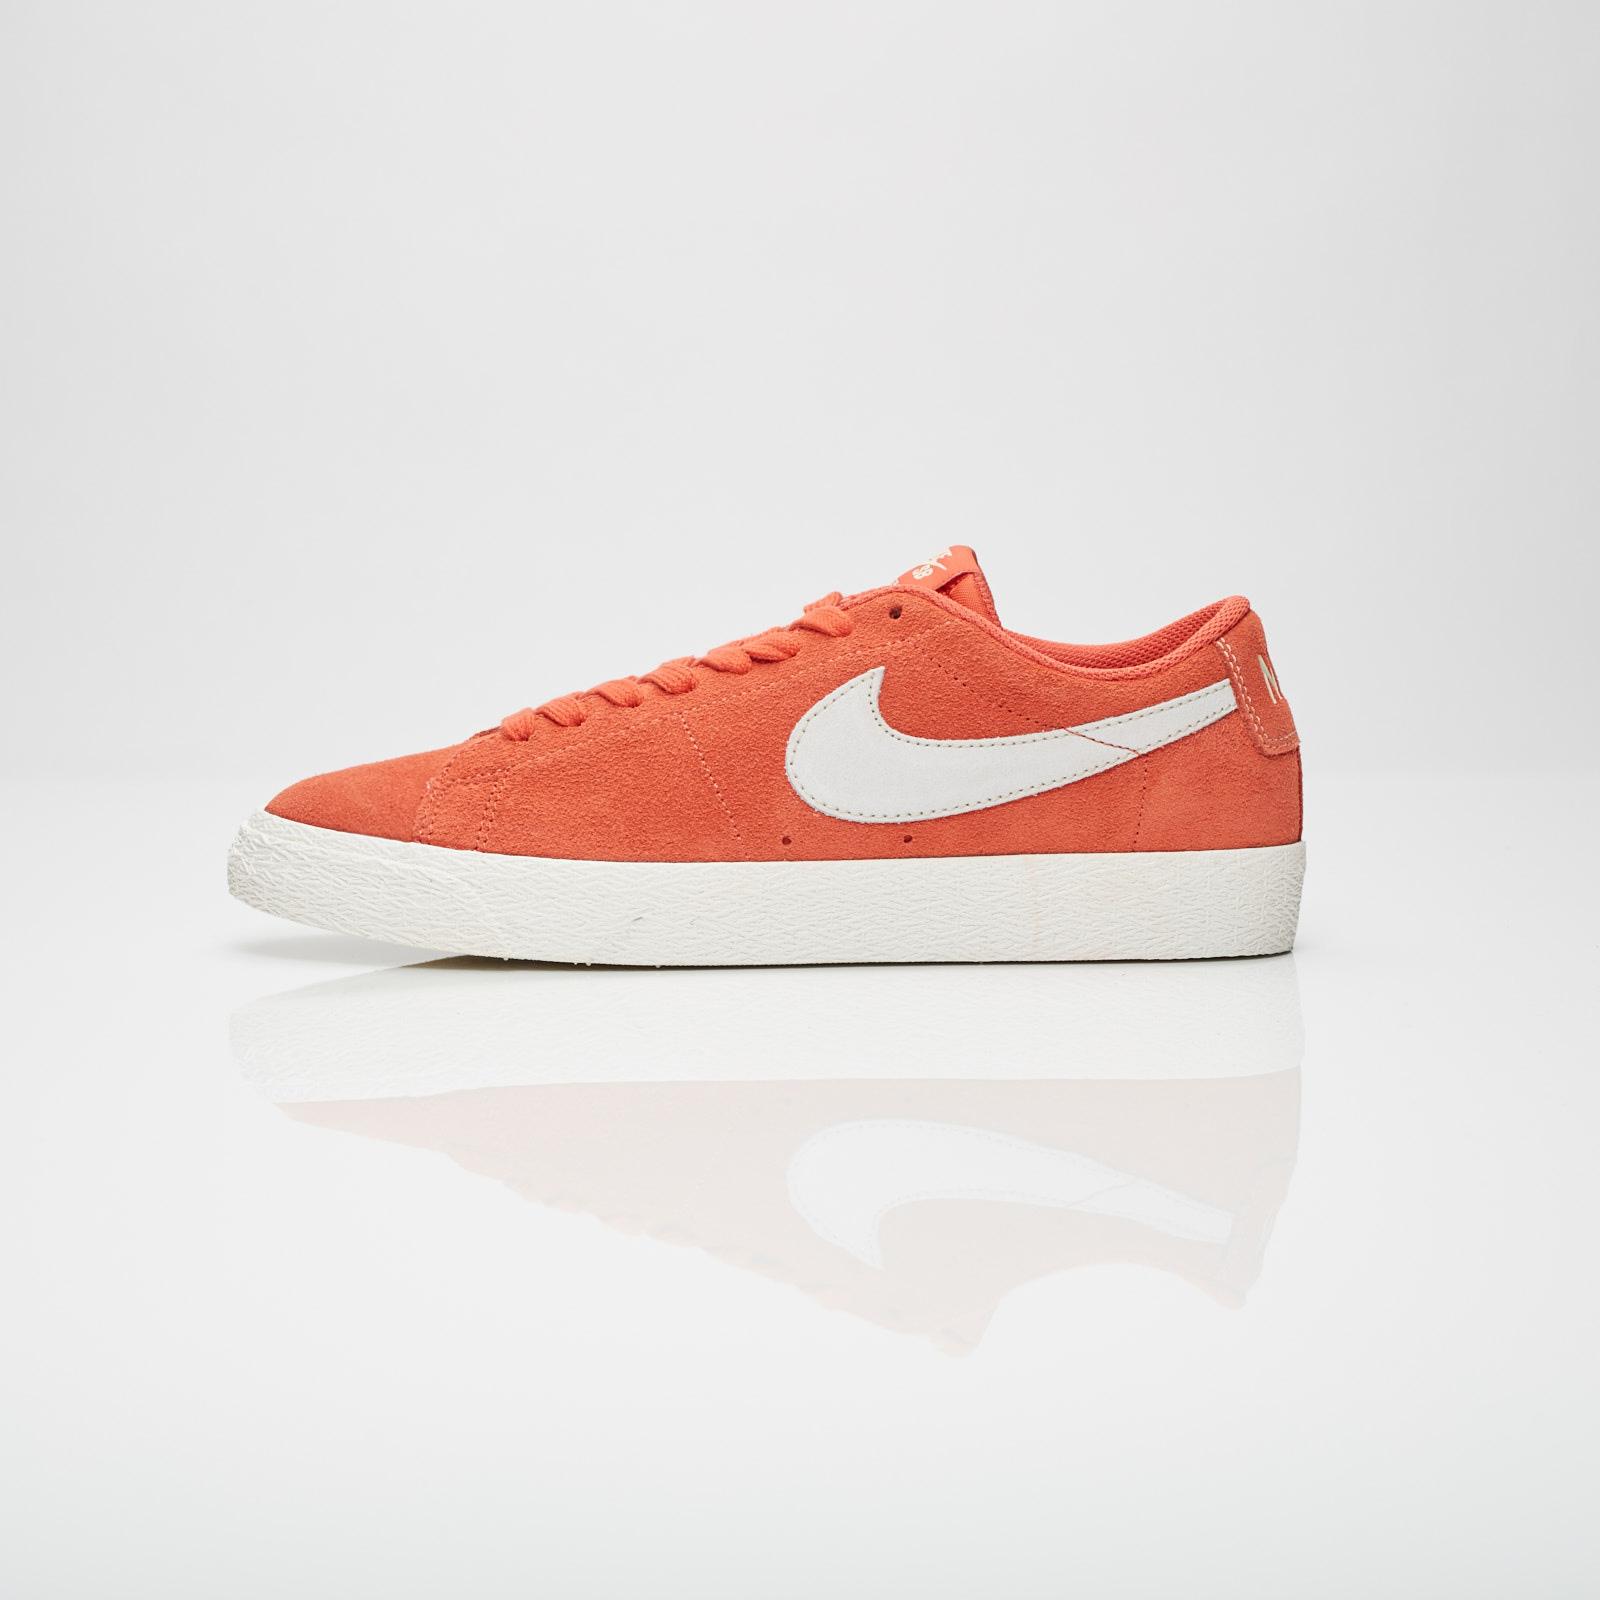 premium selection 4a066 1f9be Nike Zoom Blazer Low - 864347-800 - Sneakersnstuff ...